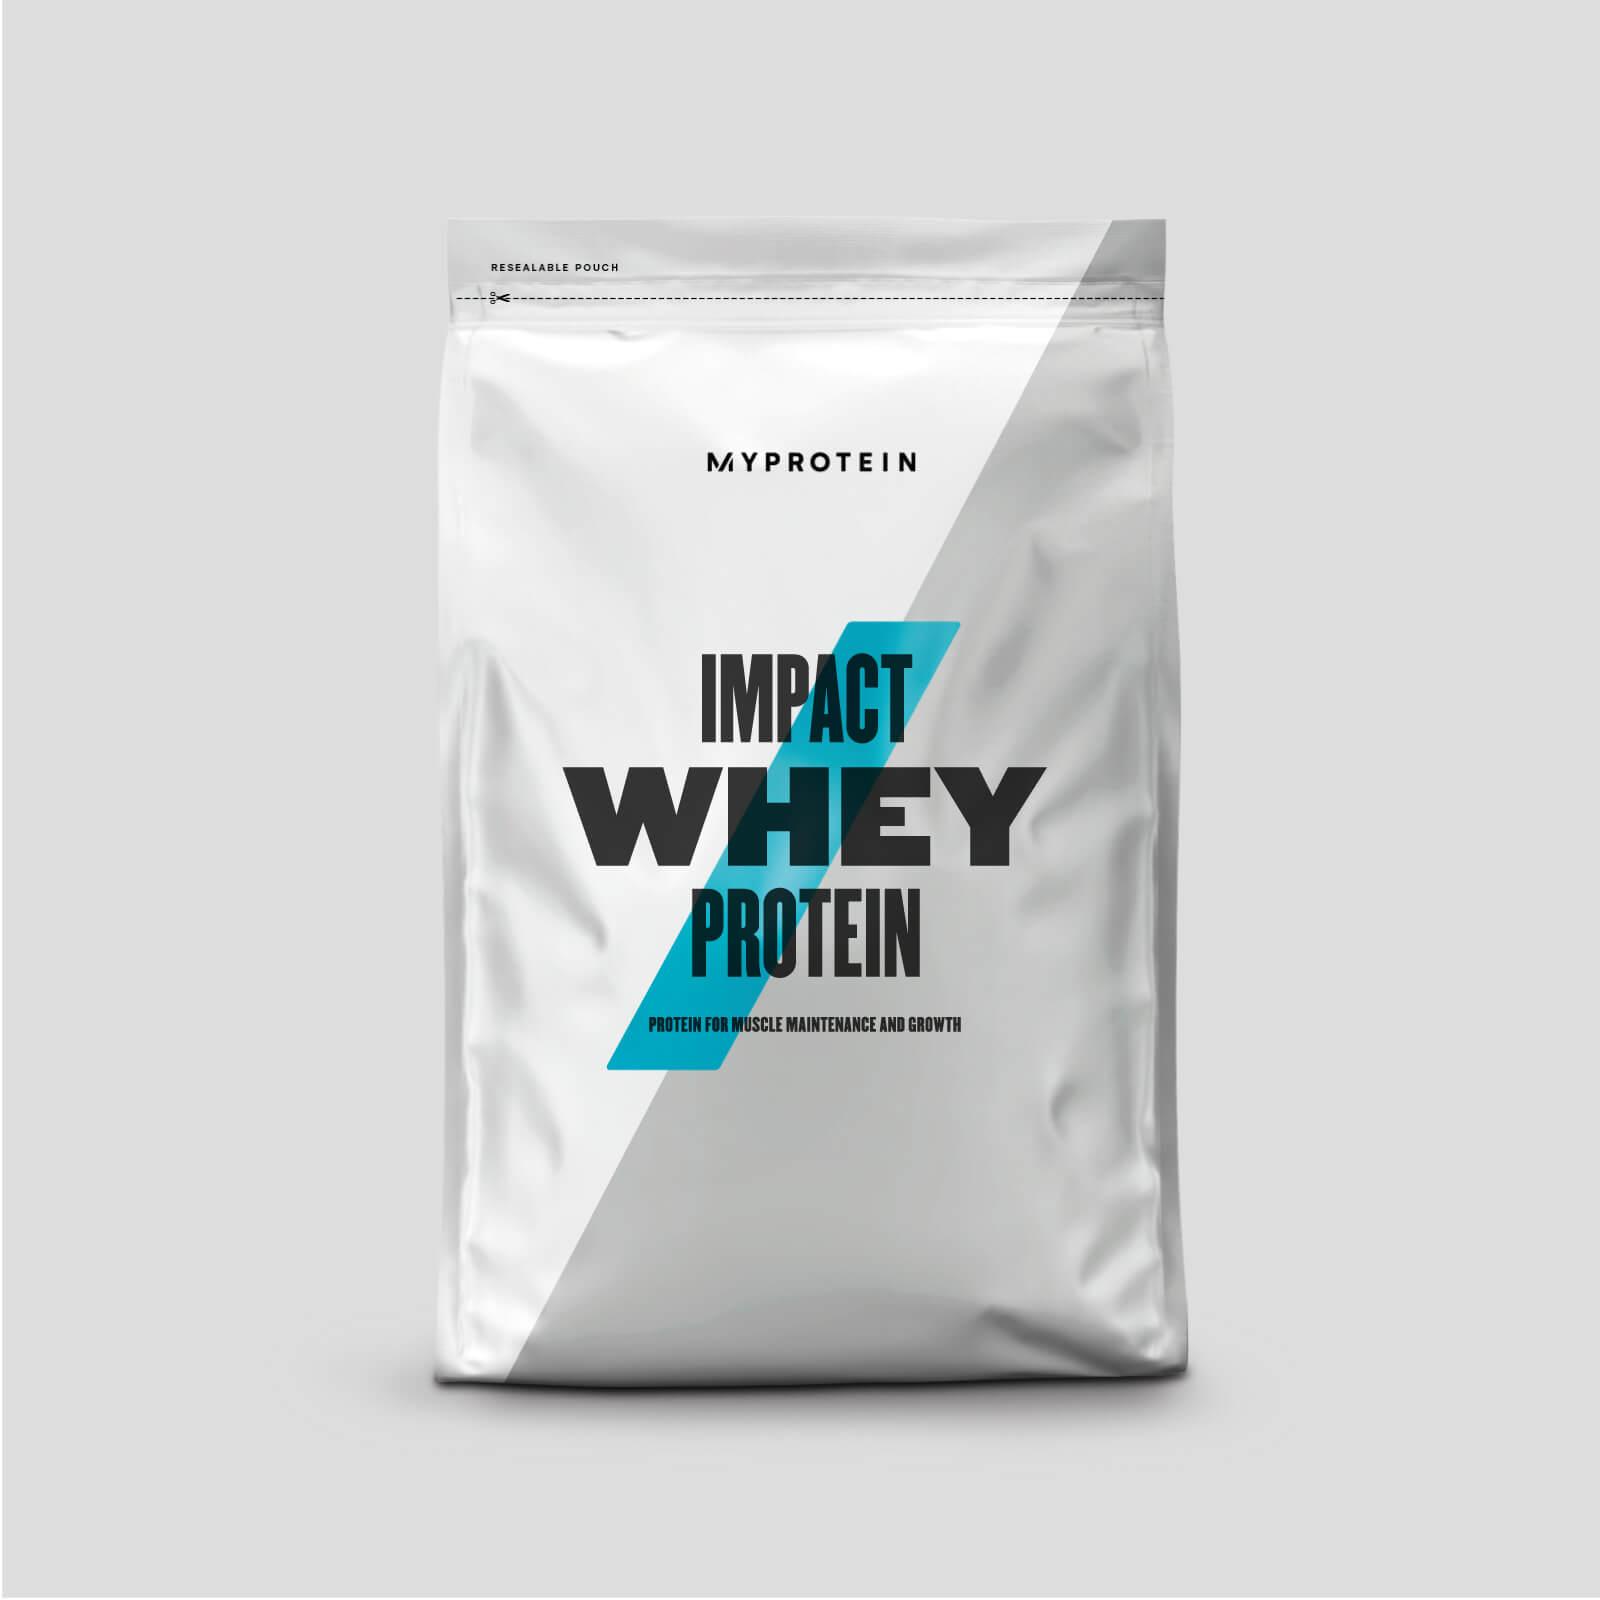 Myprotein Impact Whey Protein - 2.5kg - Vanilla Stevia